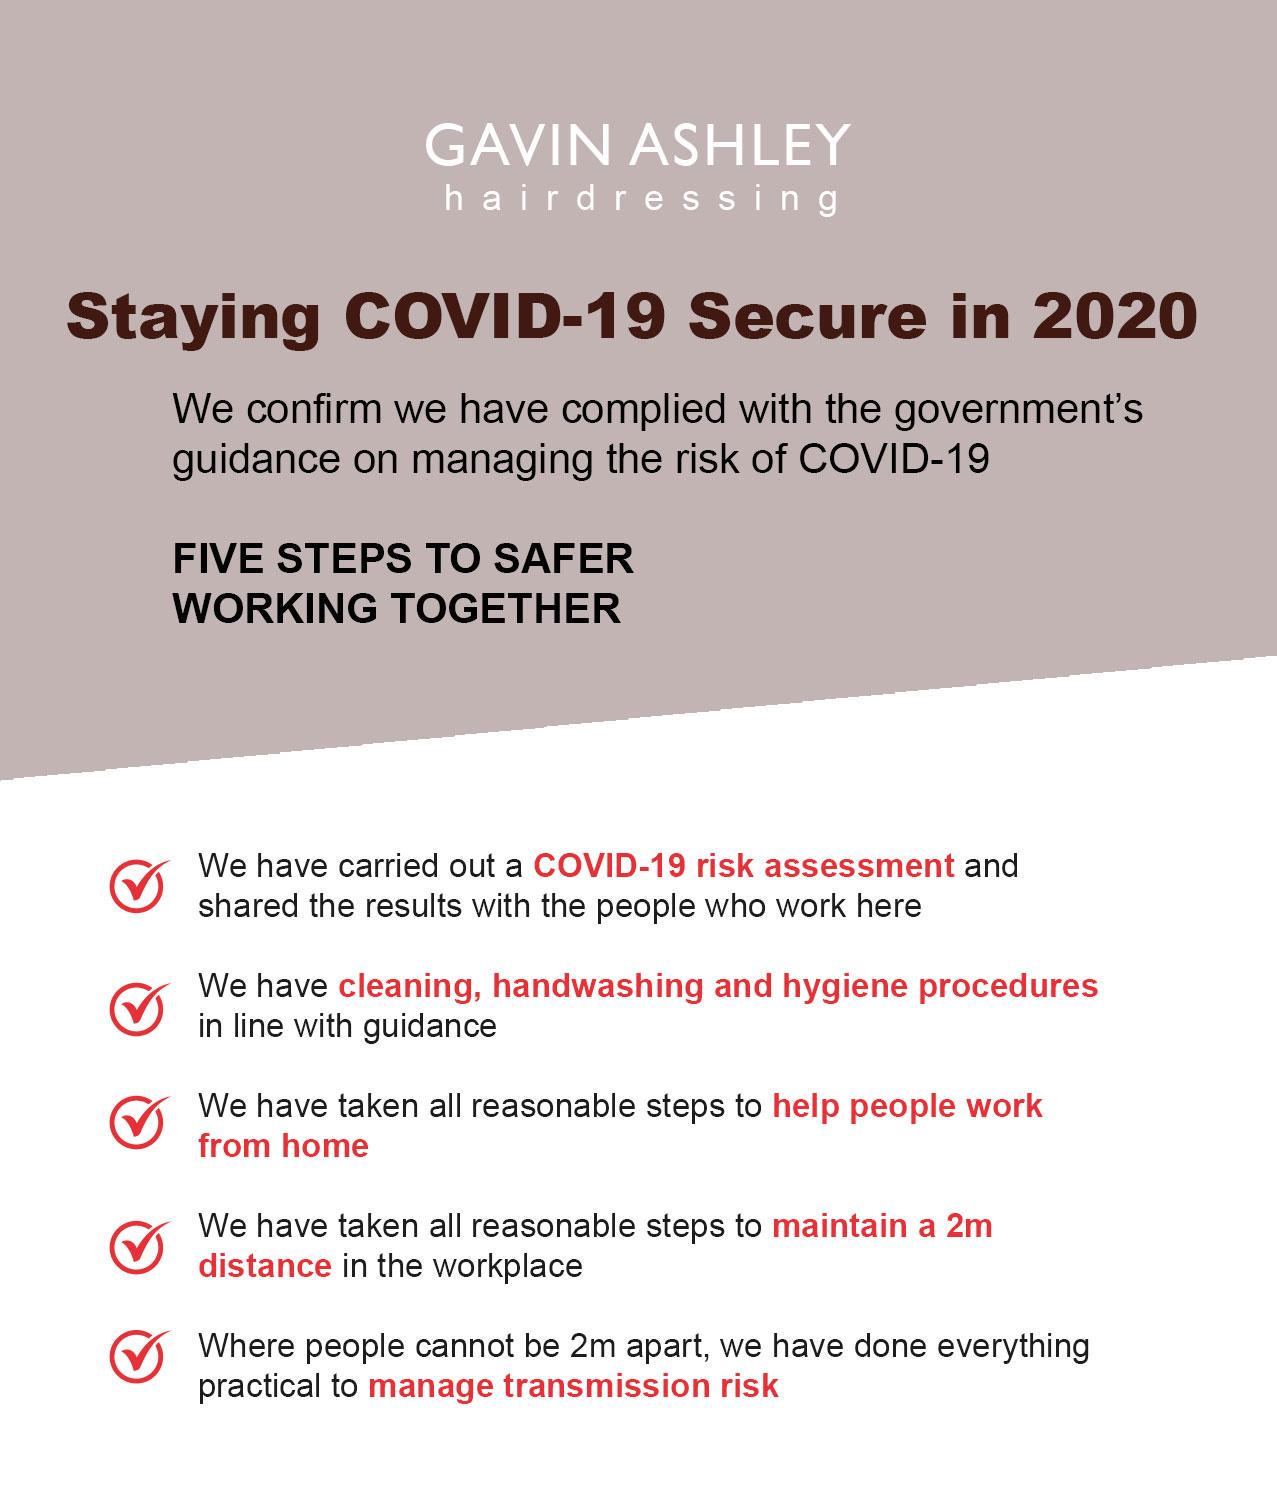 gavin ashley hair salon in bury st edmunds Safe Staying COVID 19 Secure in 2020